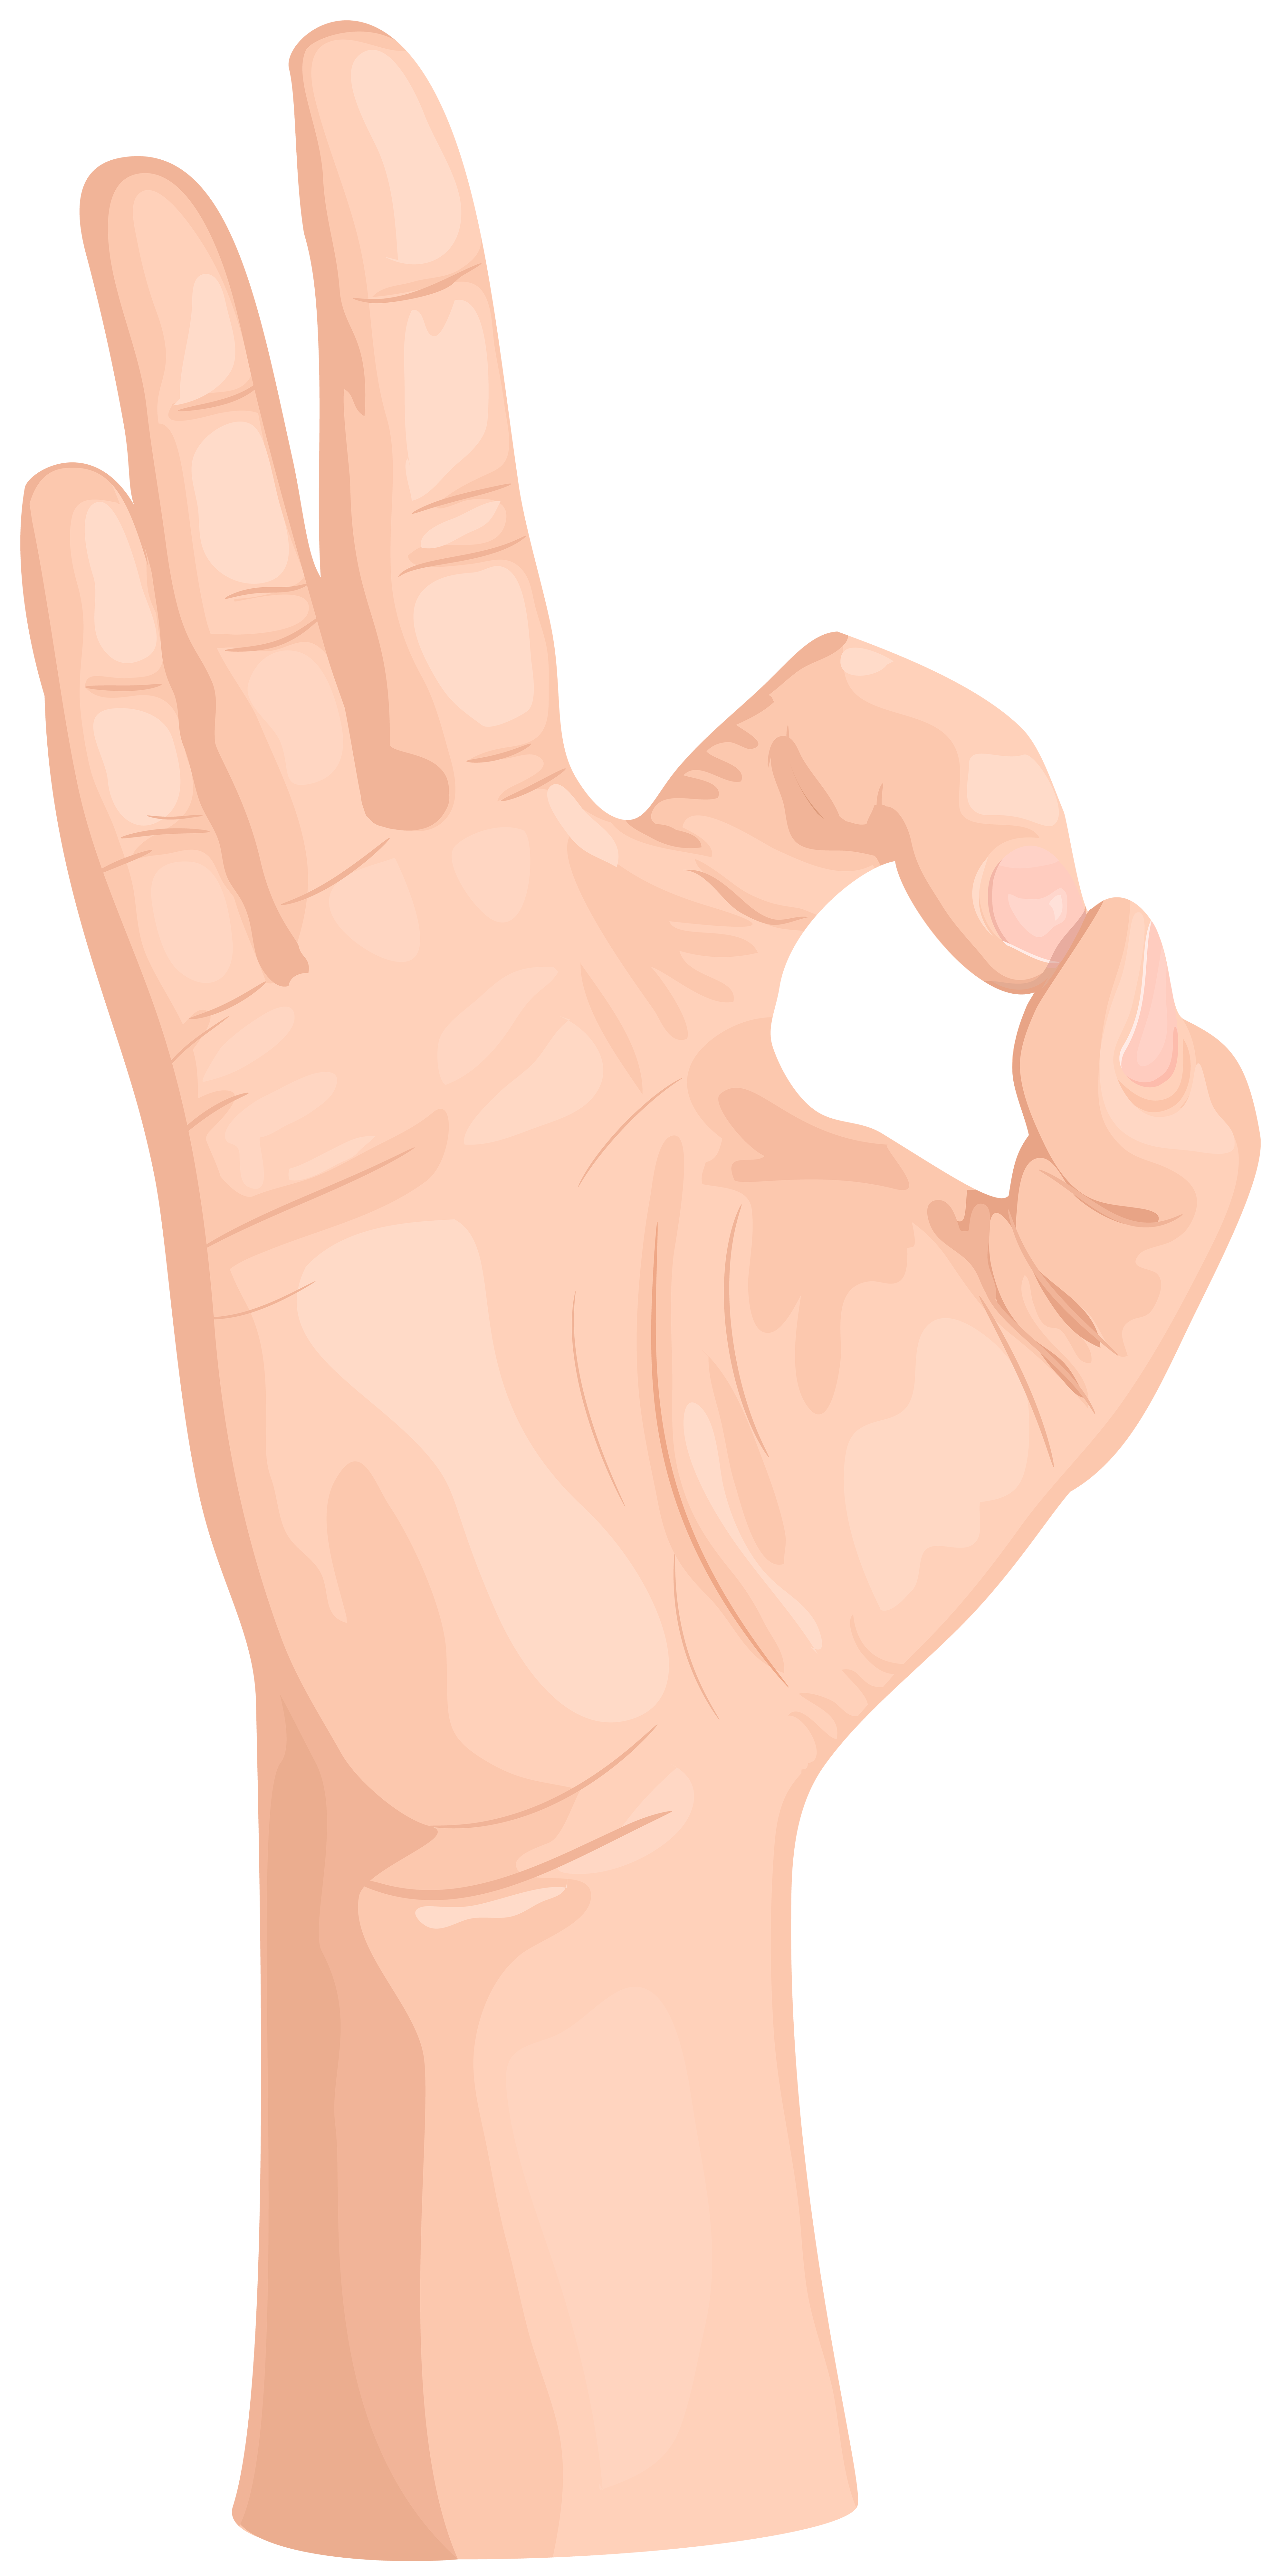 Hand Gesture clipart ok hand OK OK Transparent PNG ·